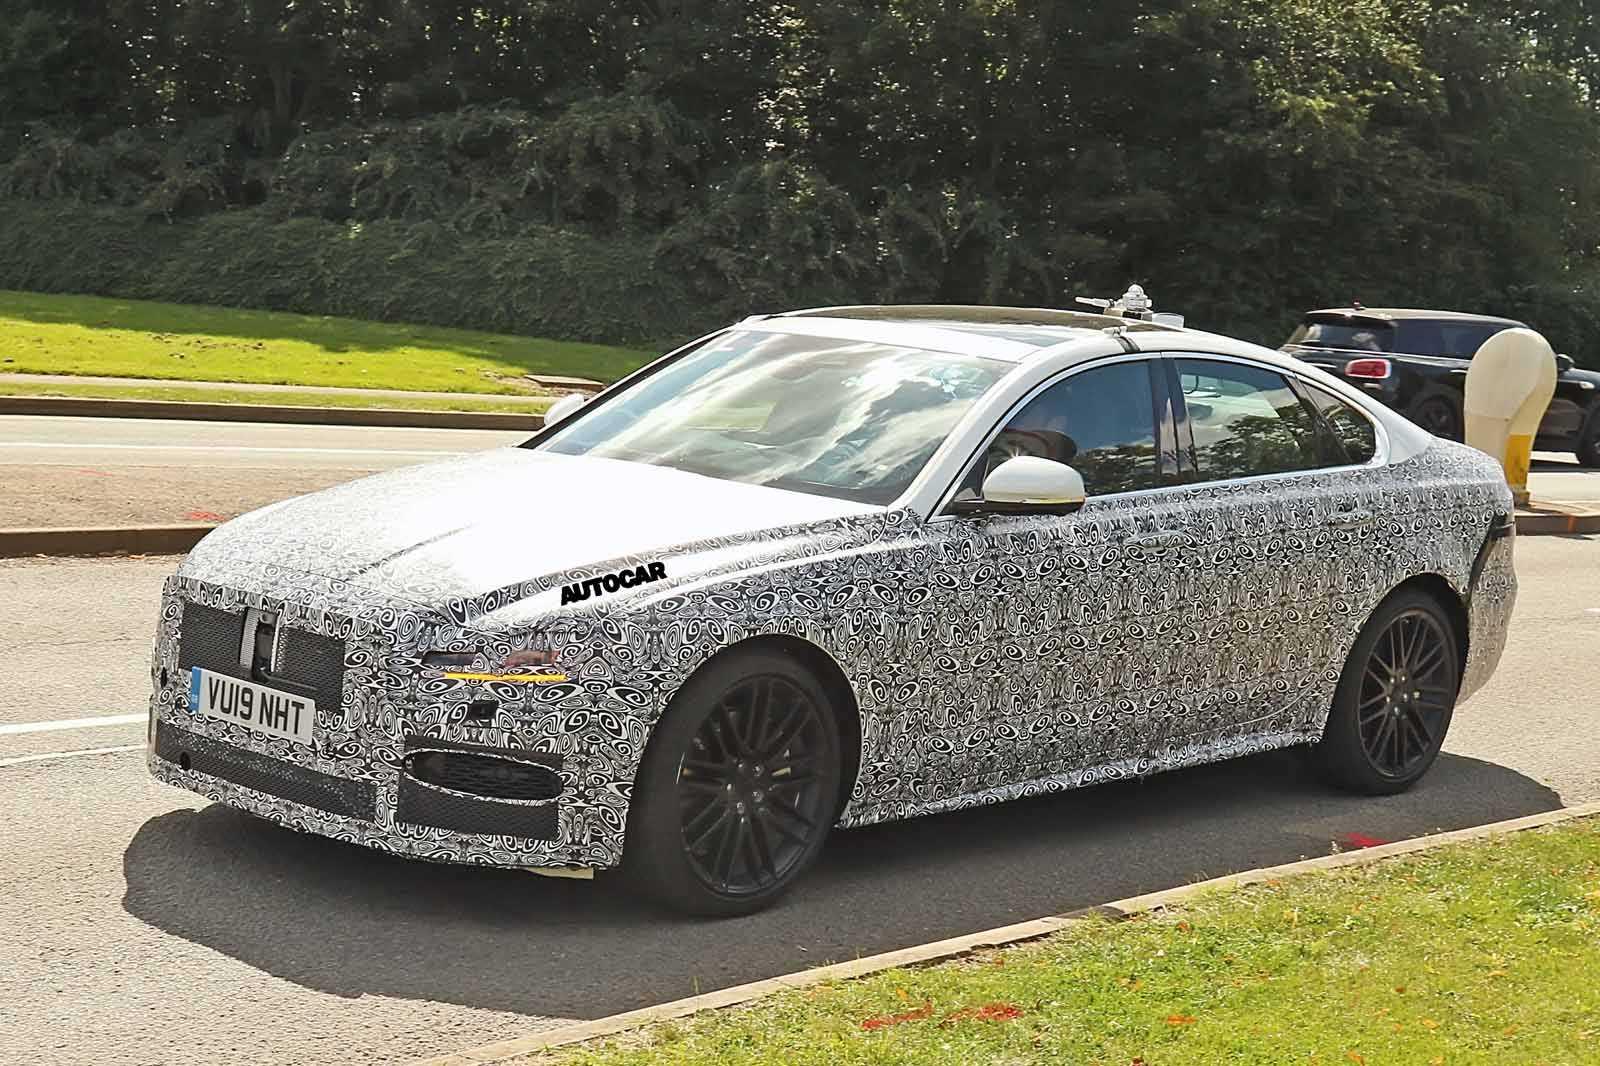 Jaguar xj 3.0 s/c awd at luxury swb (02.2016 - н.в.) - технические характеристики